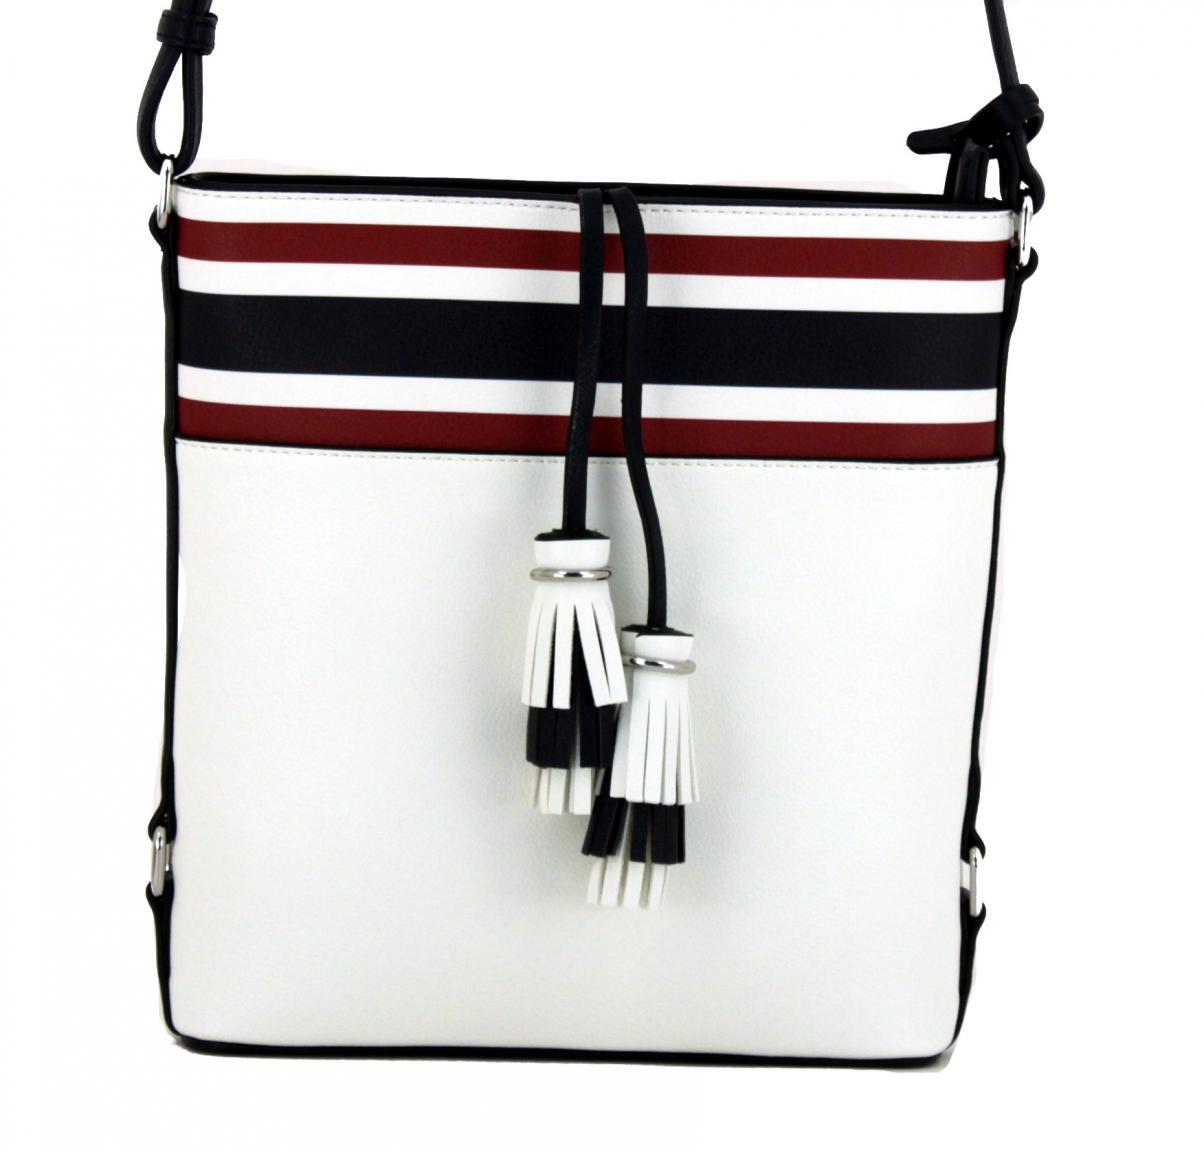 Crossbody Bag L.Credi Cristen weiß rot blau Fransenanhänger